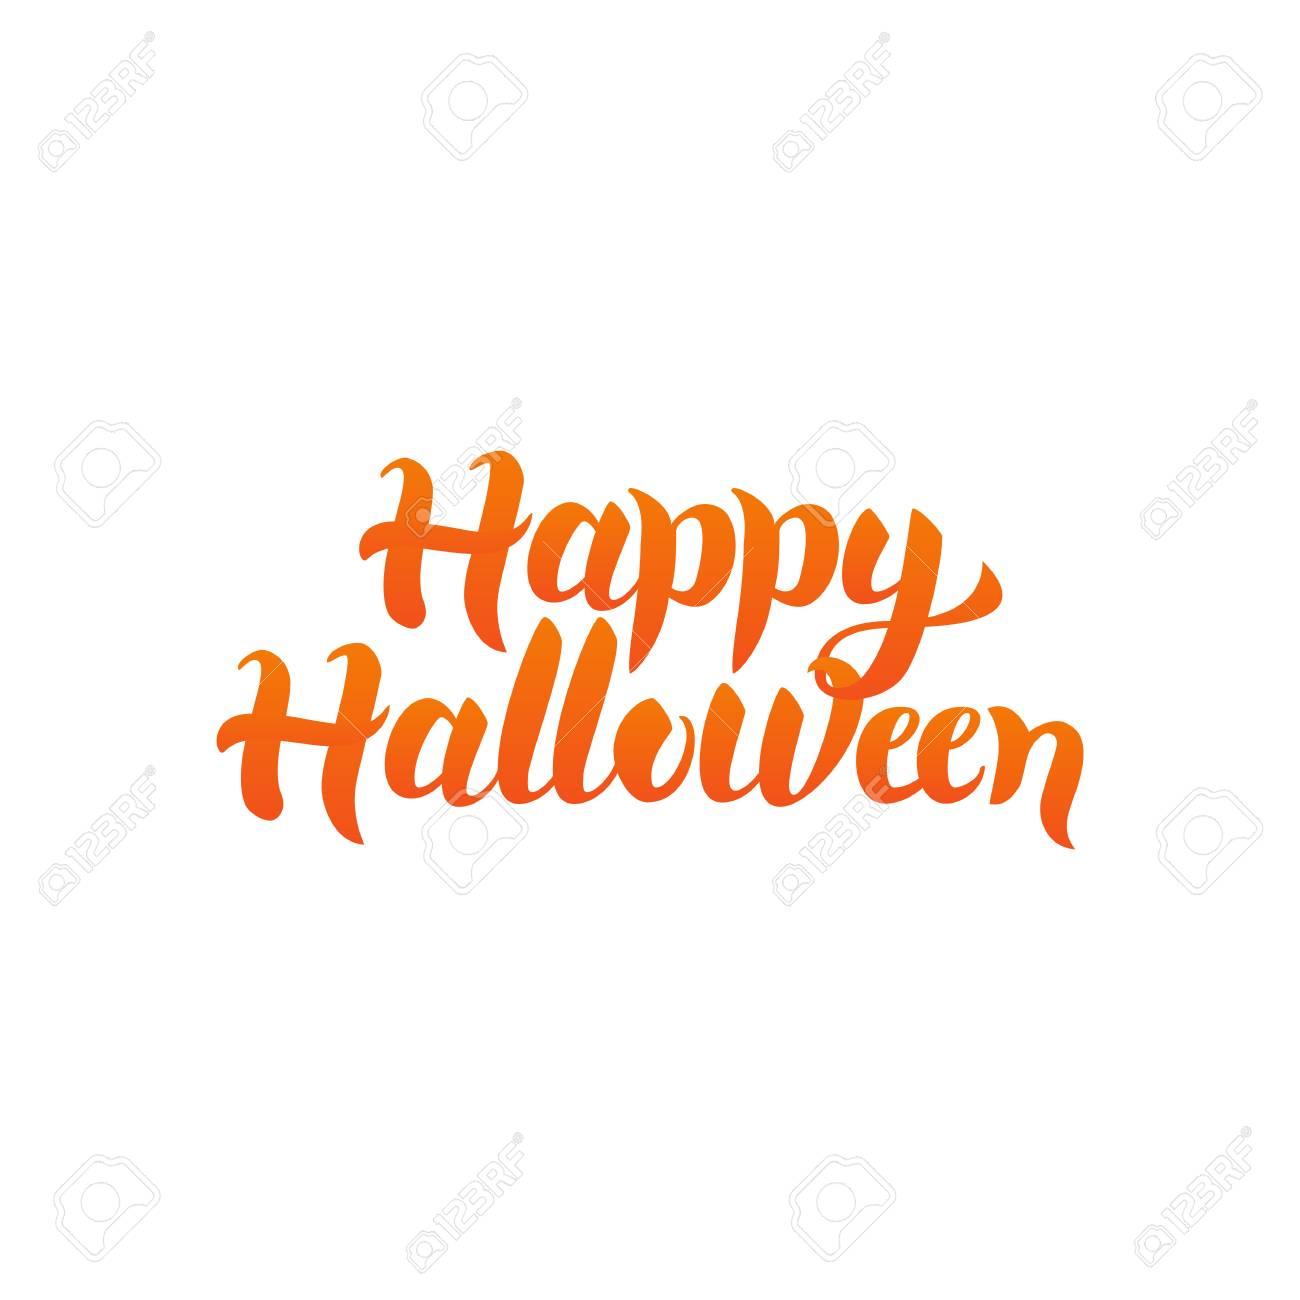 Halloween Quote.Happy Halloween Quote Vector Illustration Of Ink Brush Calligraphy